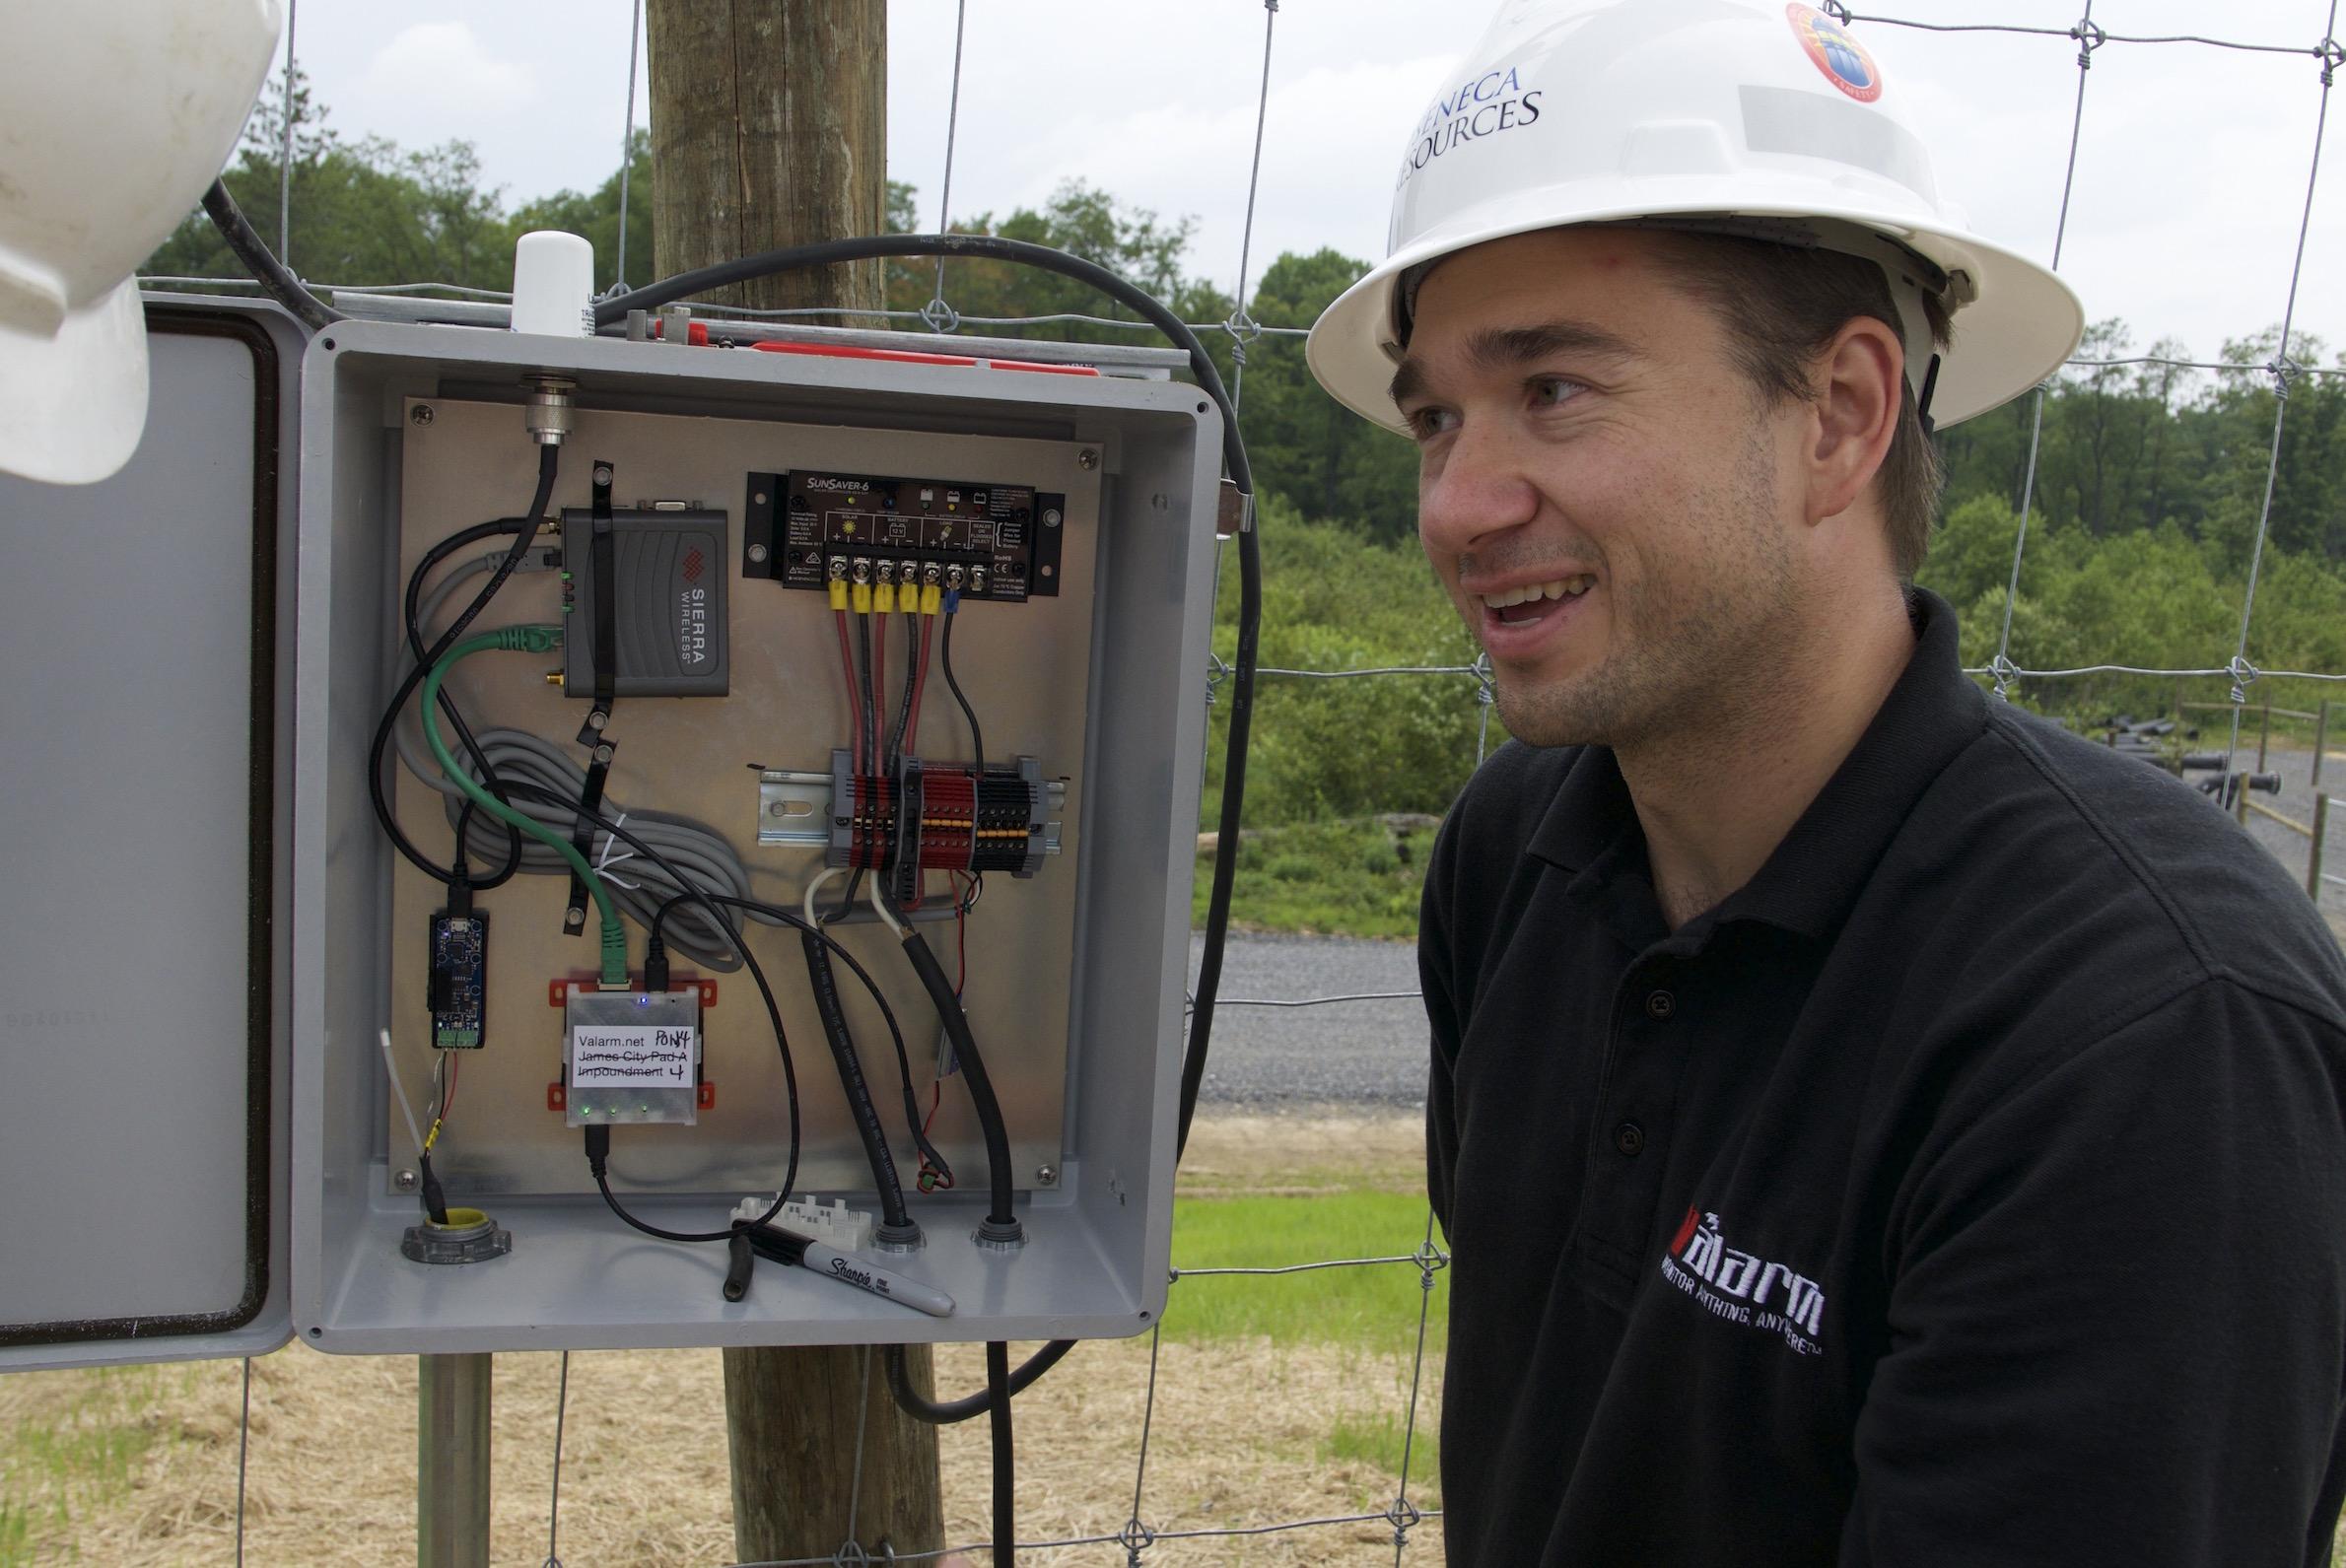 Valarm Water Level Sensor Monitoring Seneca Resources Oil Gas Upstream O&G Telemetry Remote Environmental Monitoring Real-Time 4